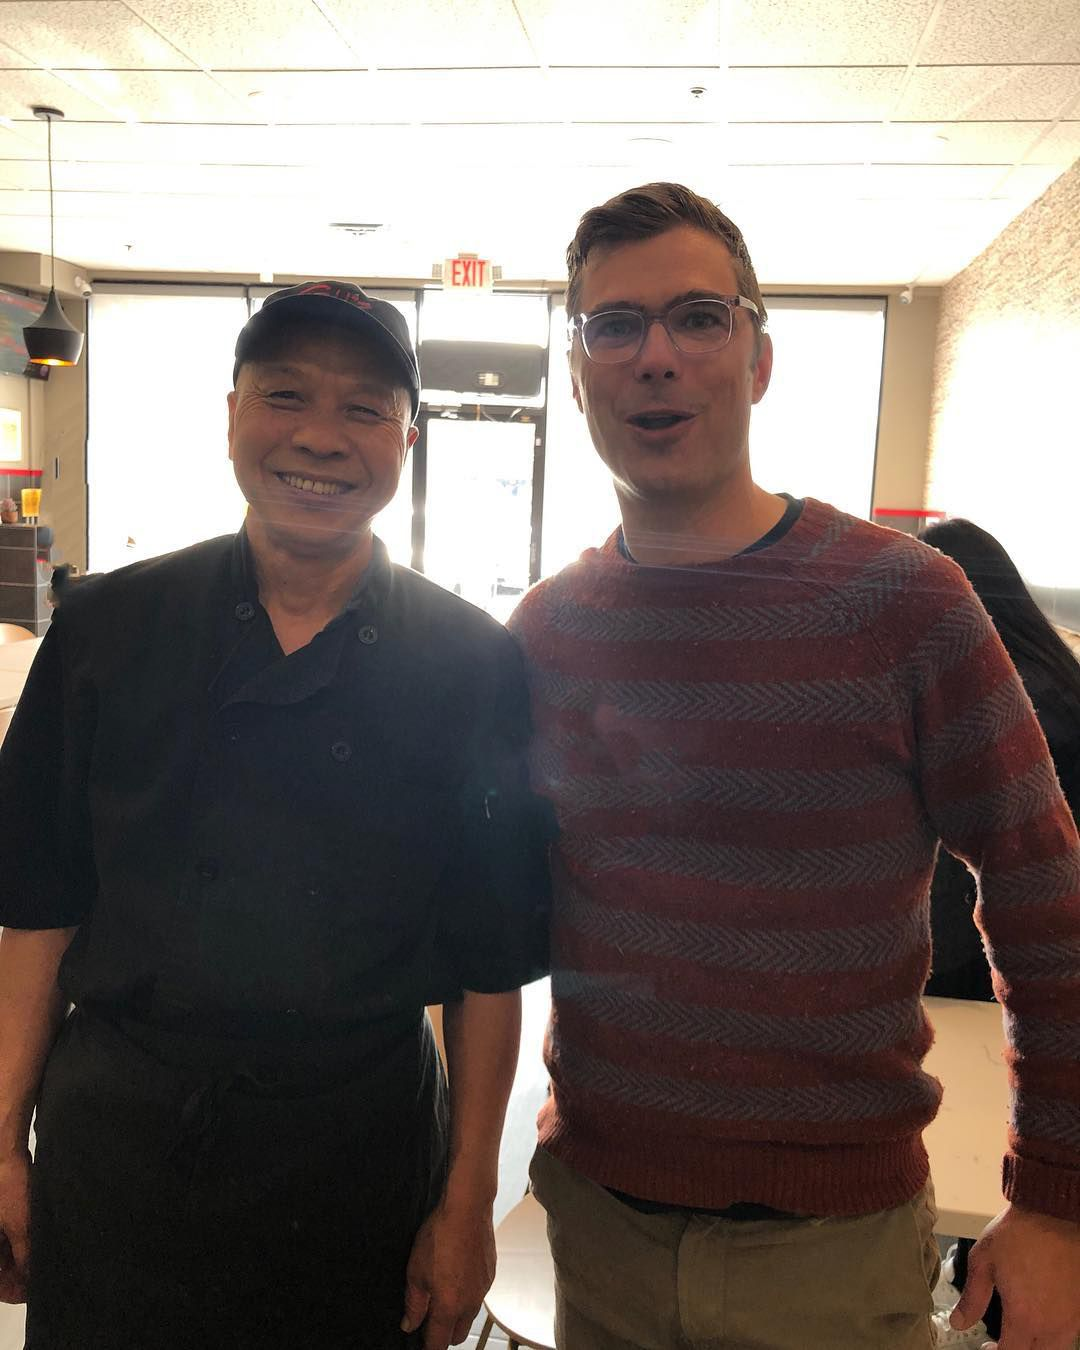 Chef Gu and chef Hugh Acheson at Gu's Kitchen on Buford Highway